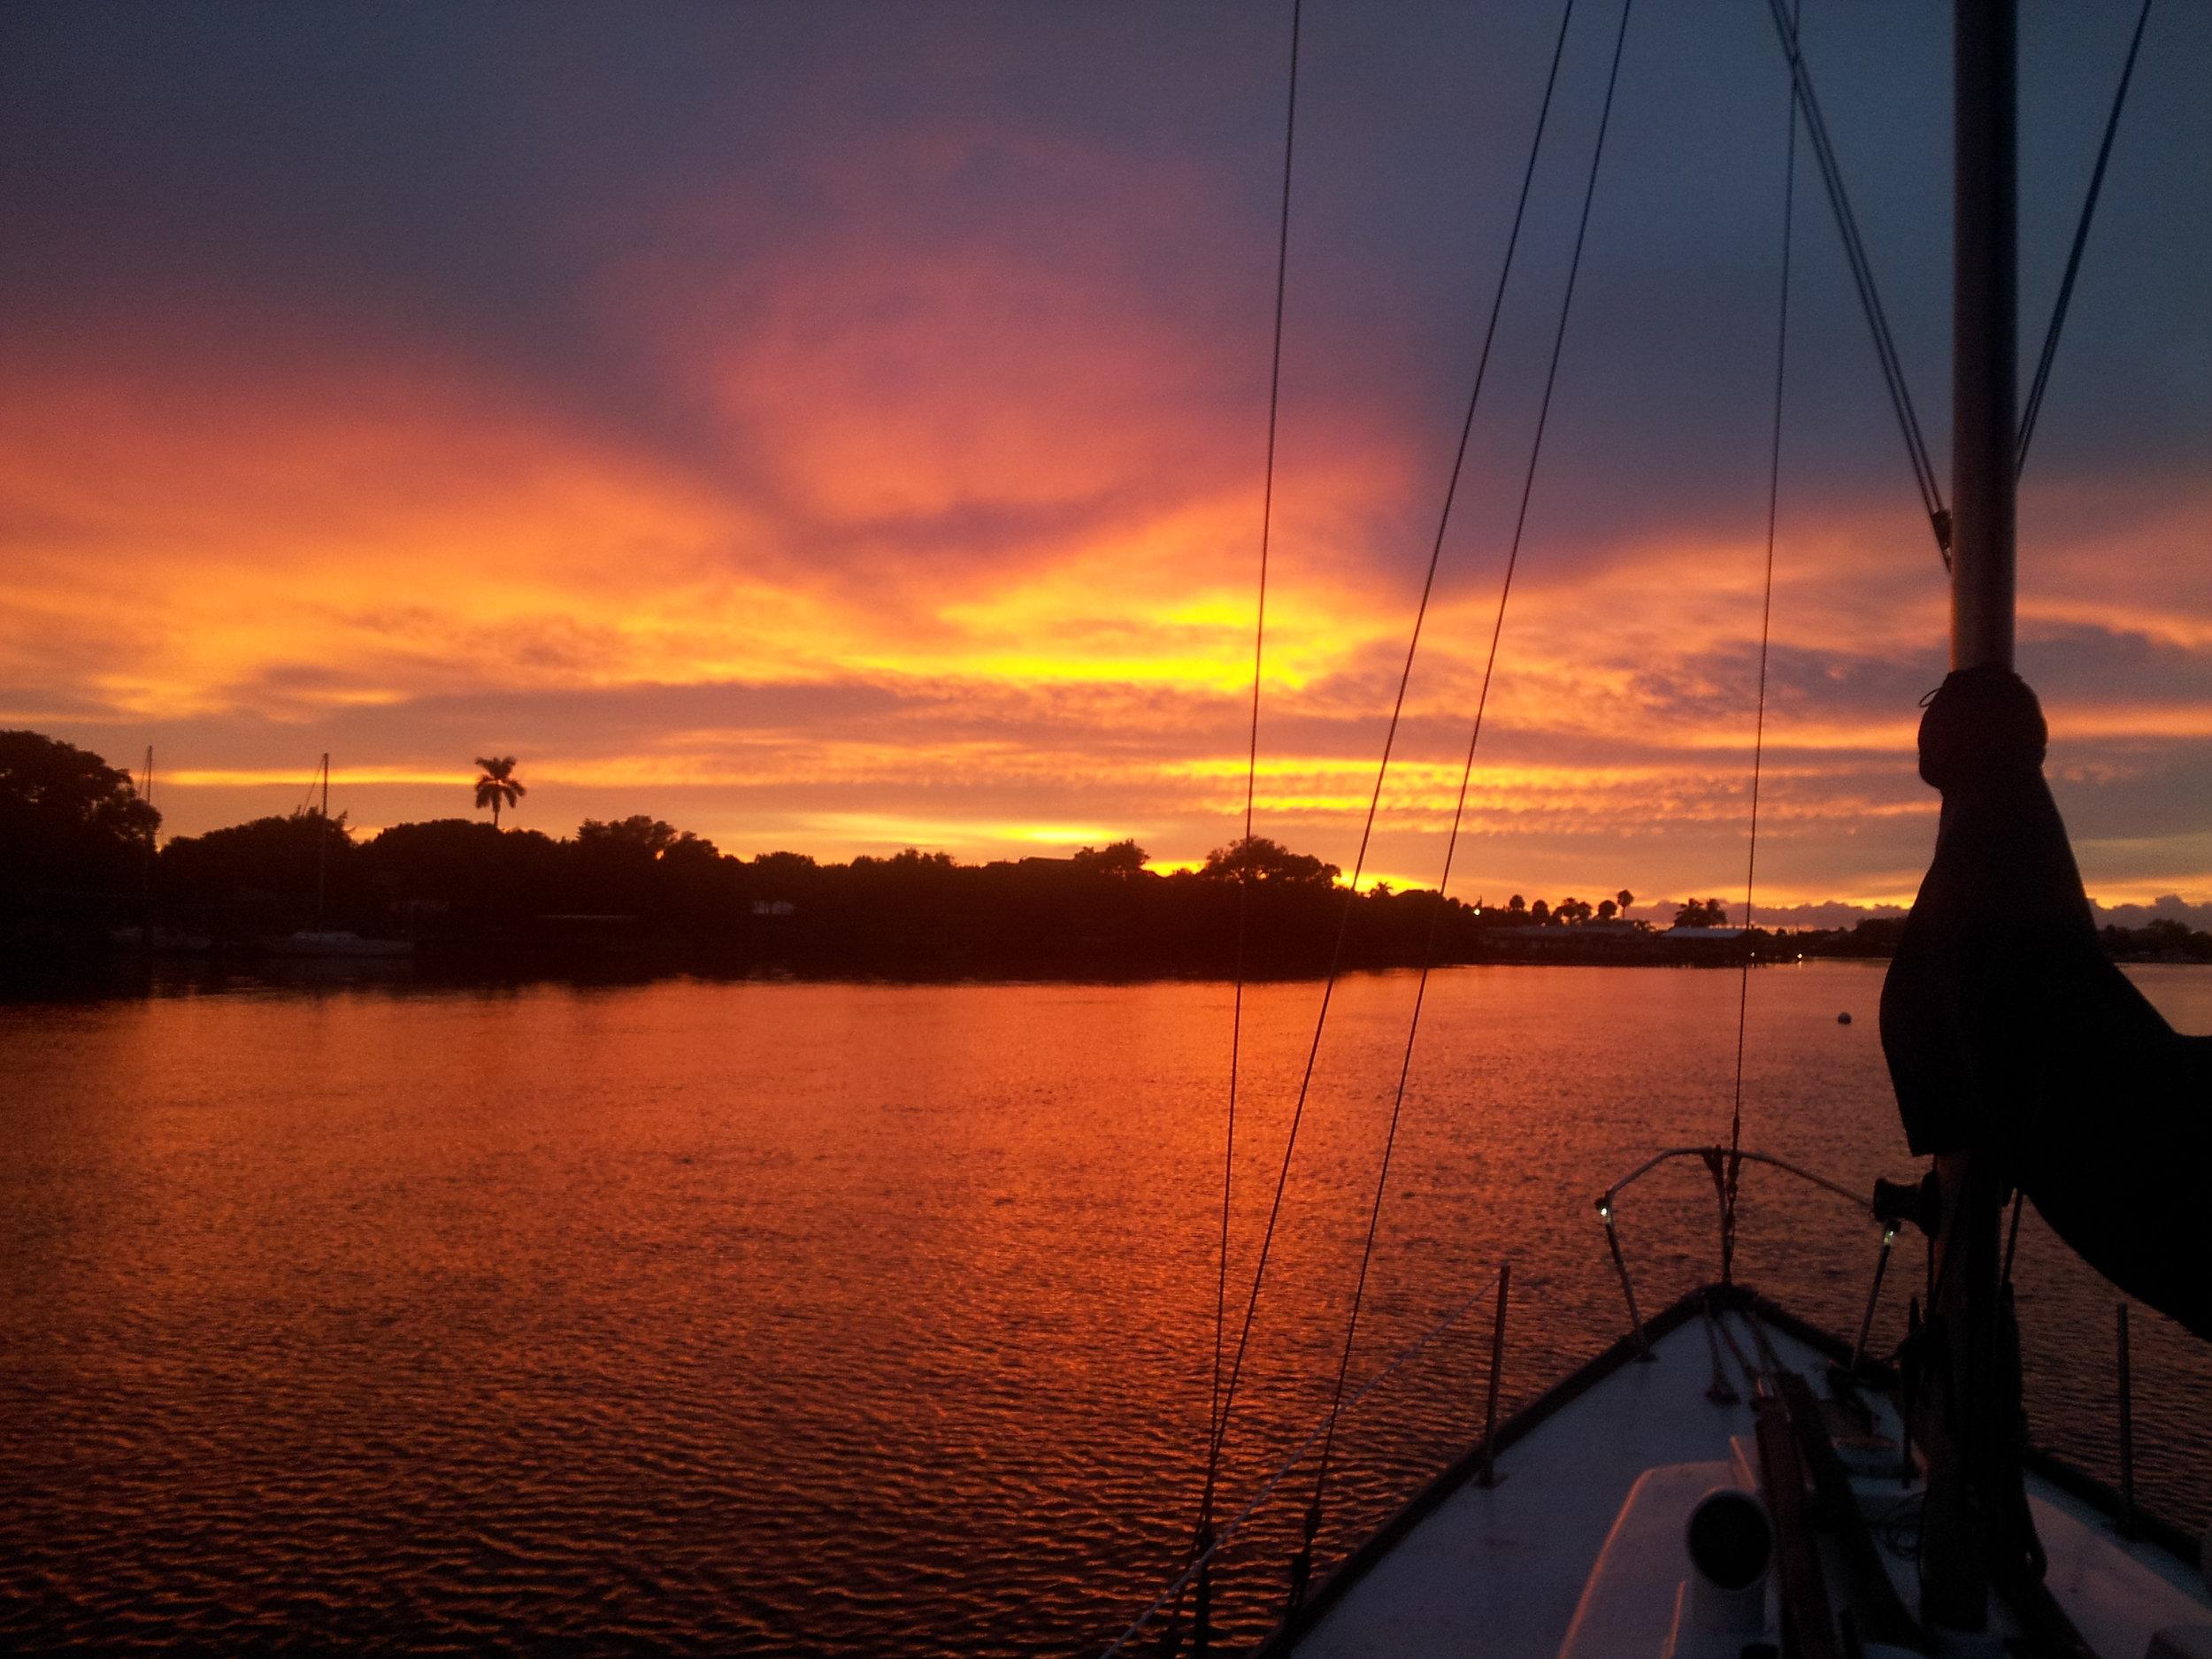 Sunset_July2014.jpg